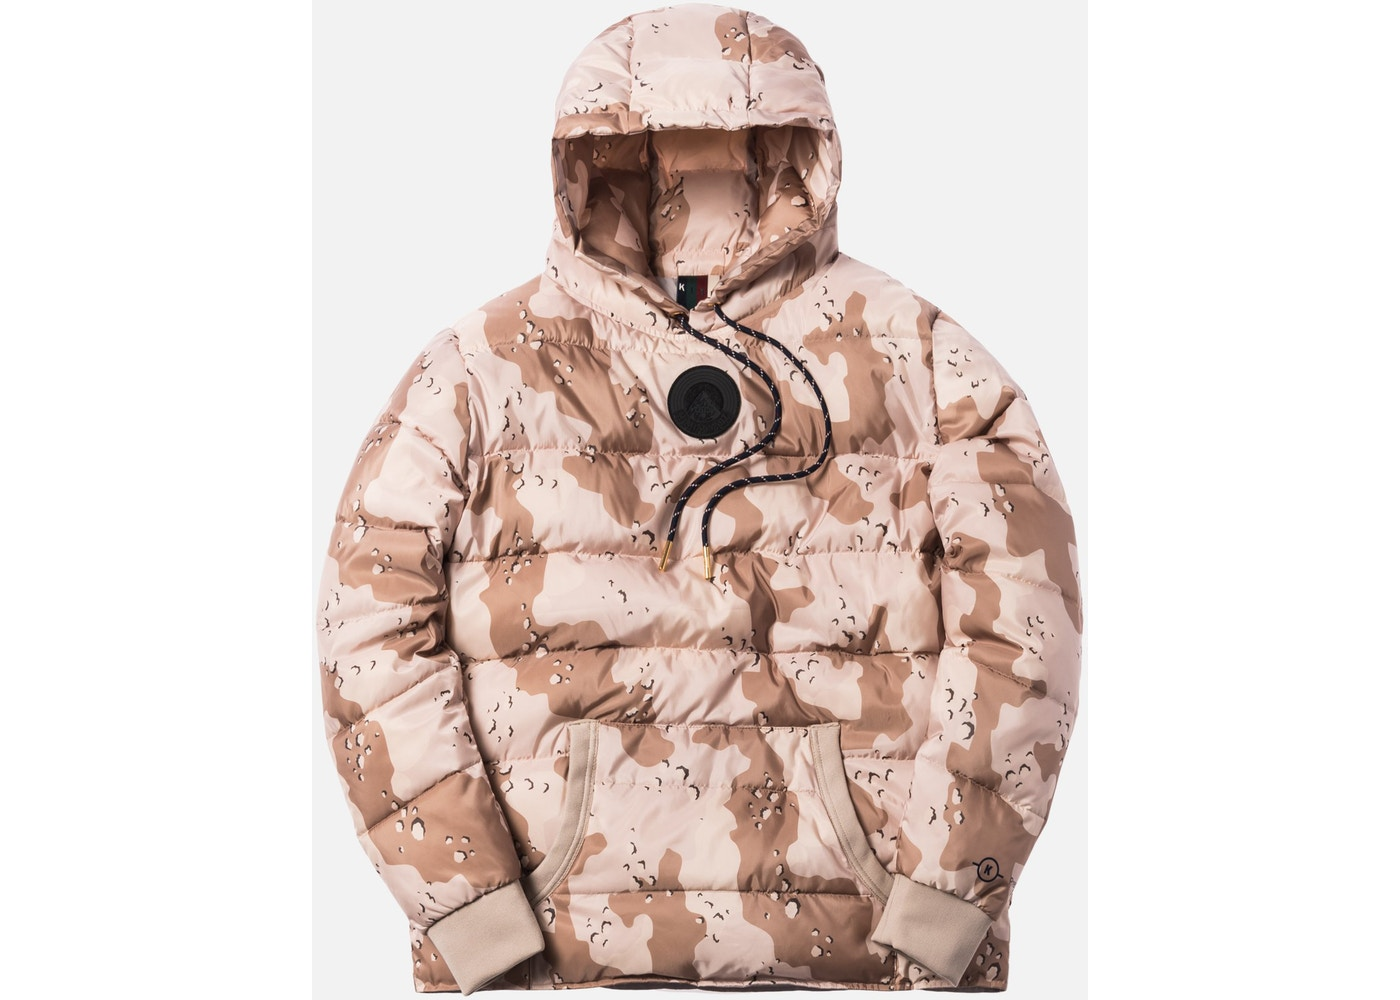 ee6bedd5ac80 Buy   Sell Kith Streetwear - New Highest Bids